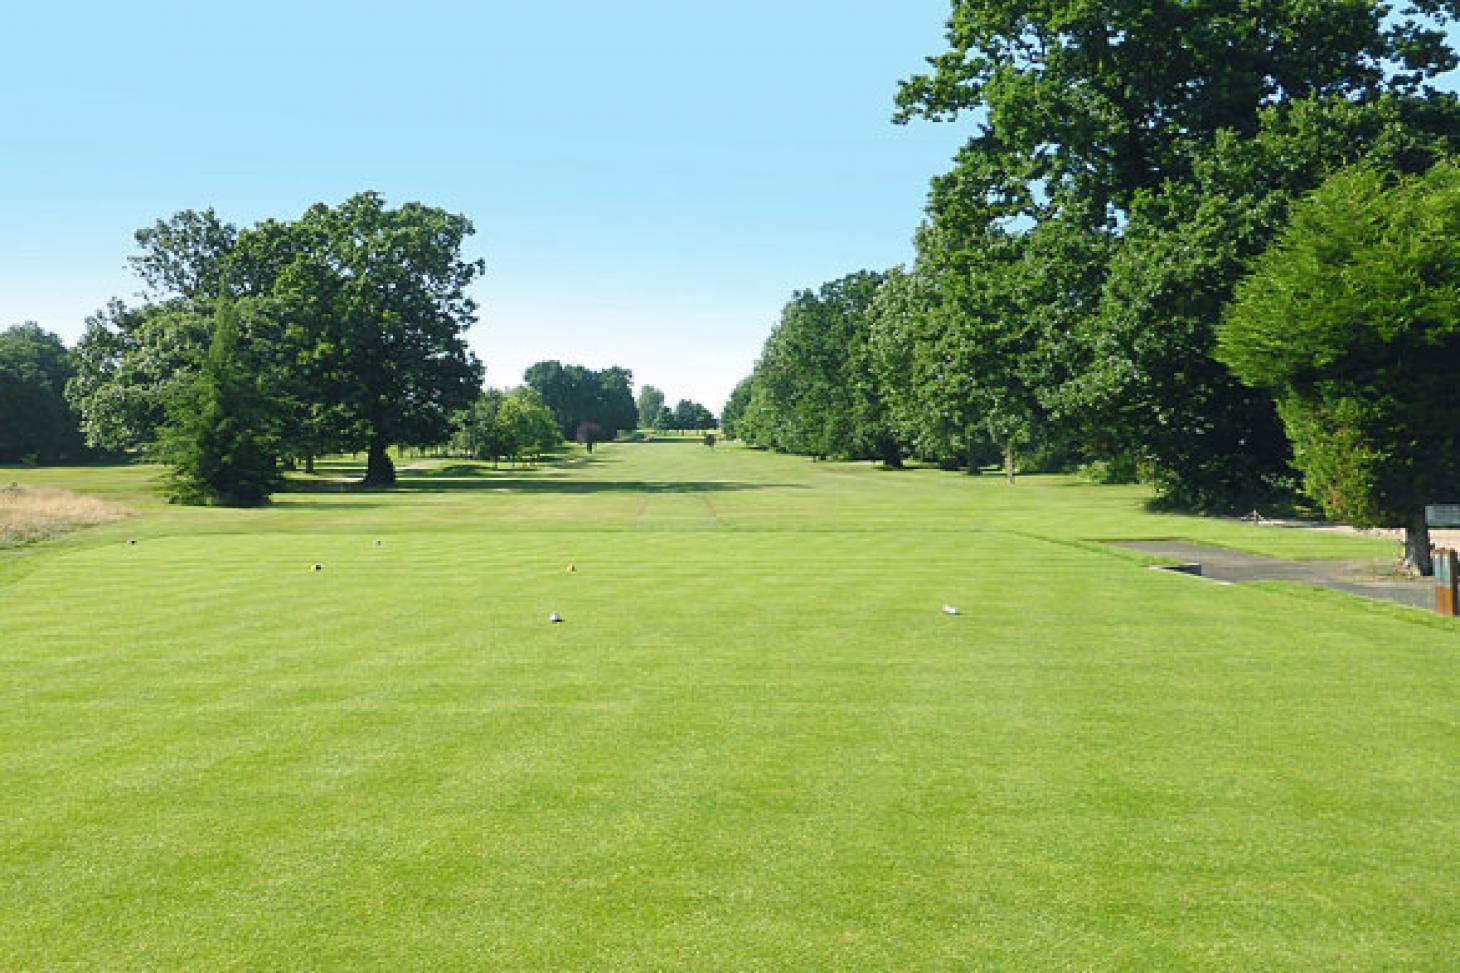 Shirley Park Golf Club 18 hole golf course